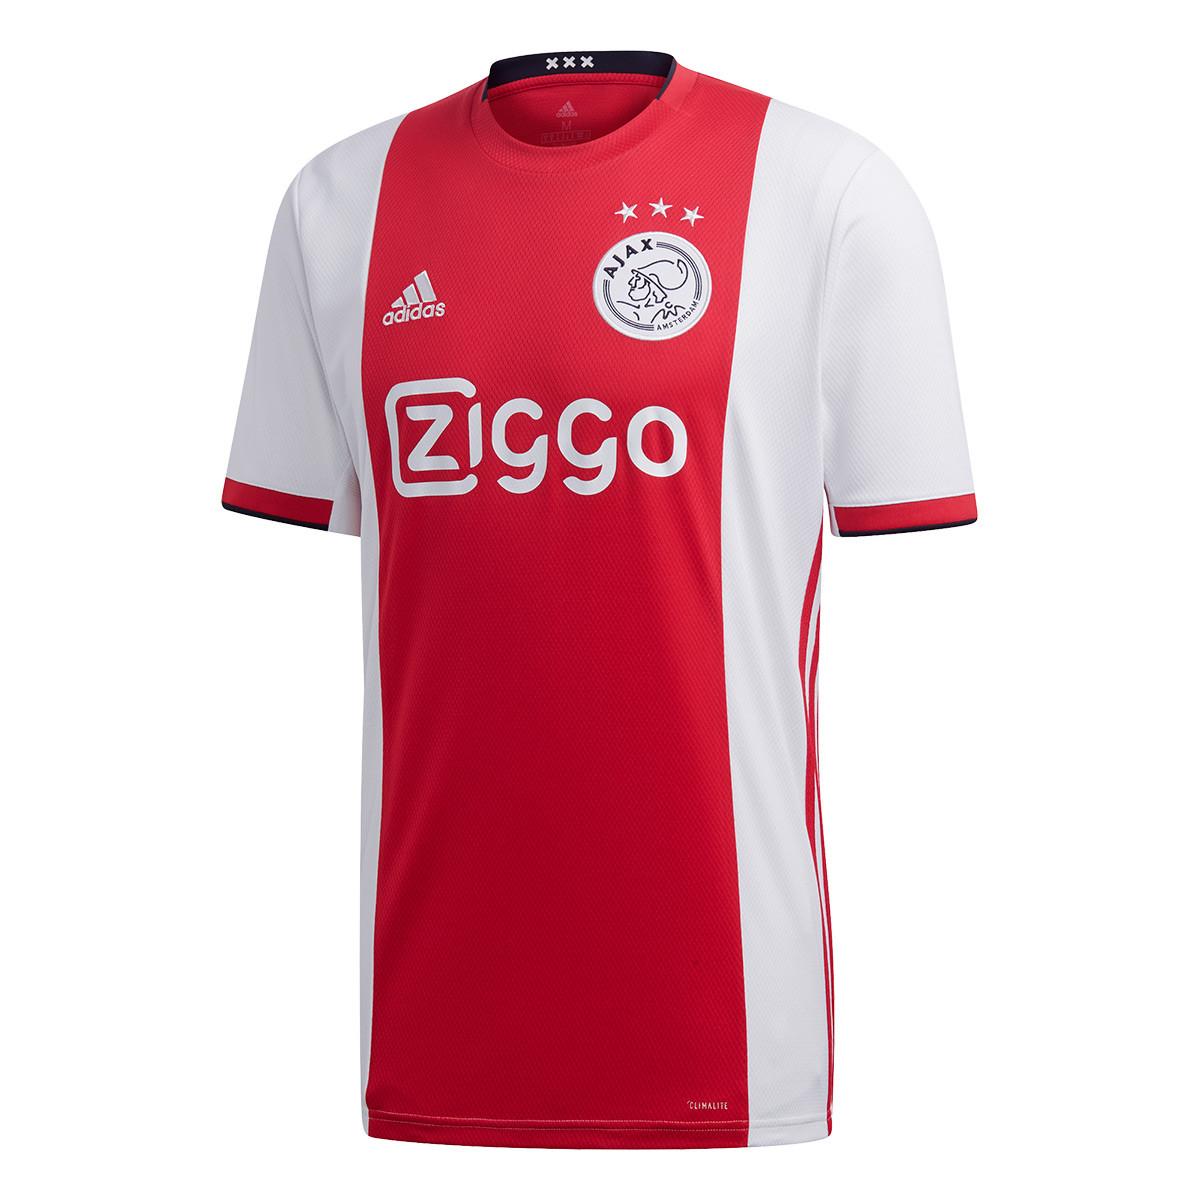 Maillot adidas Ajax FC Domicile 2019 2020